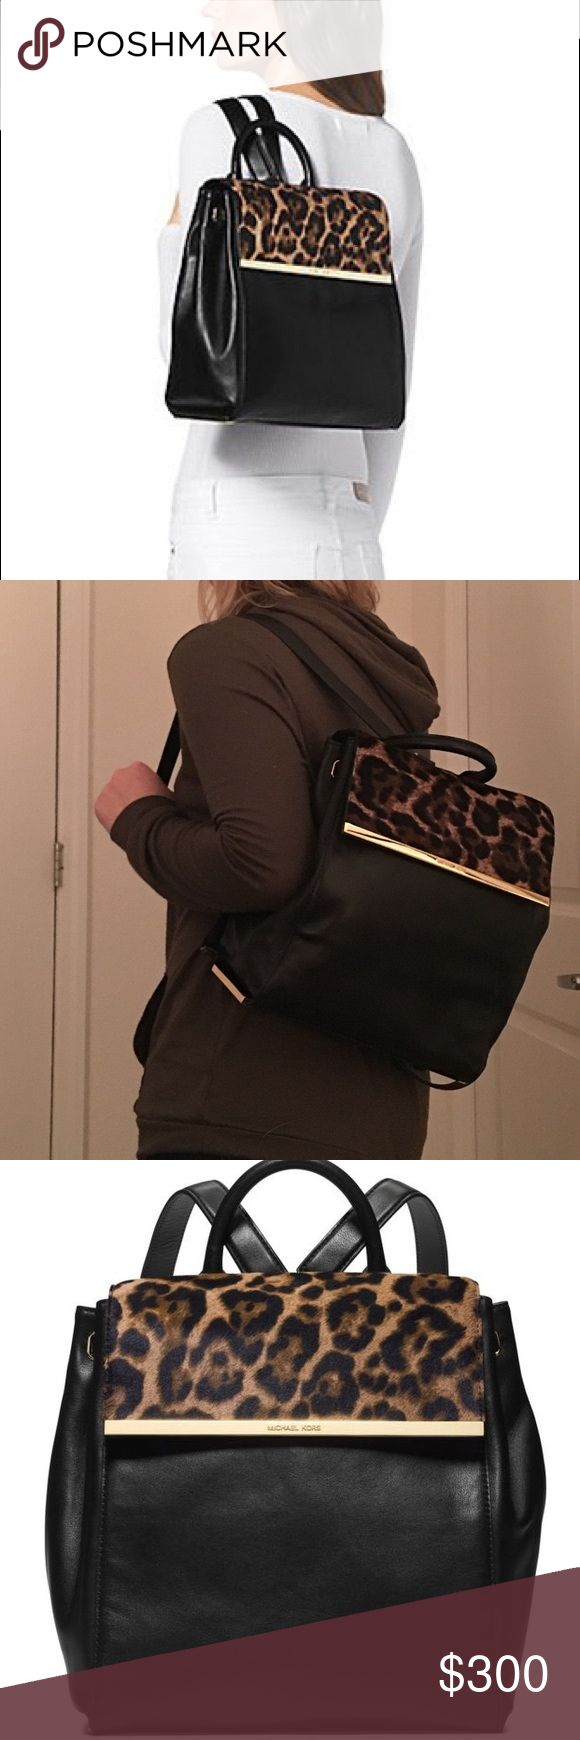 Michael kors back pack black Lana Michael Kors - Nwt Women's Black Lana Leopard-Print Hair Calf And Leather Backpack Michael Kors Bags Backpacks